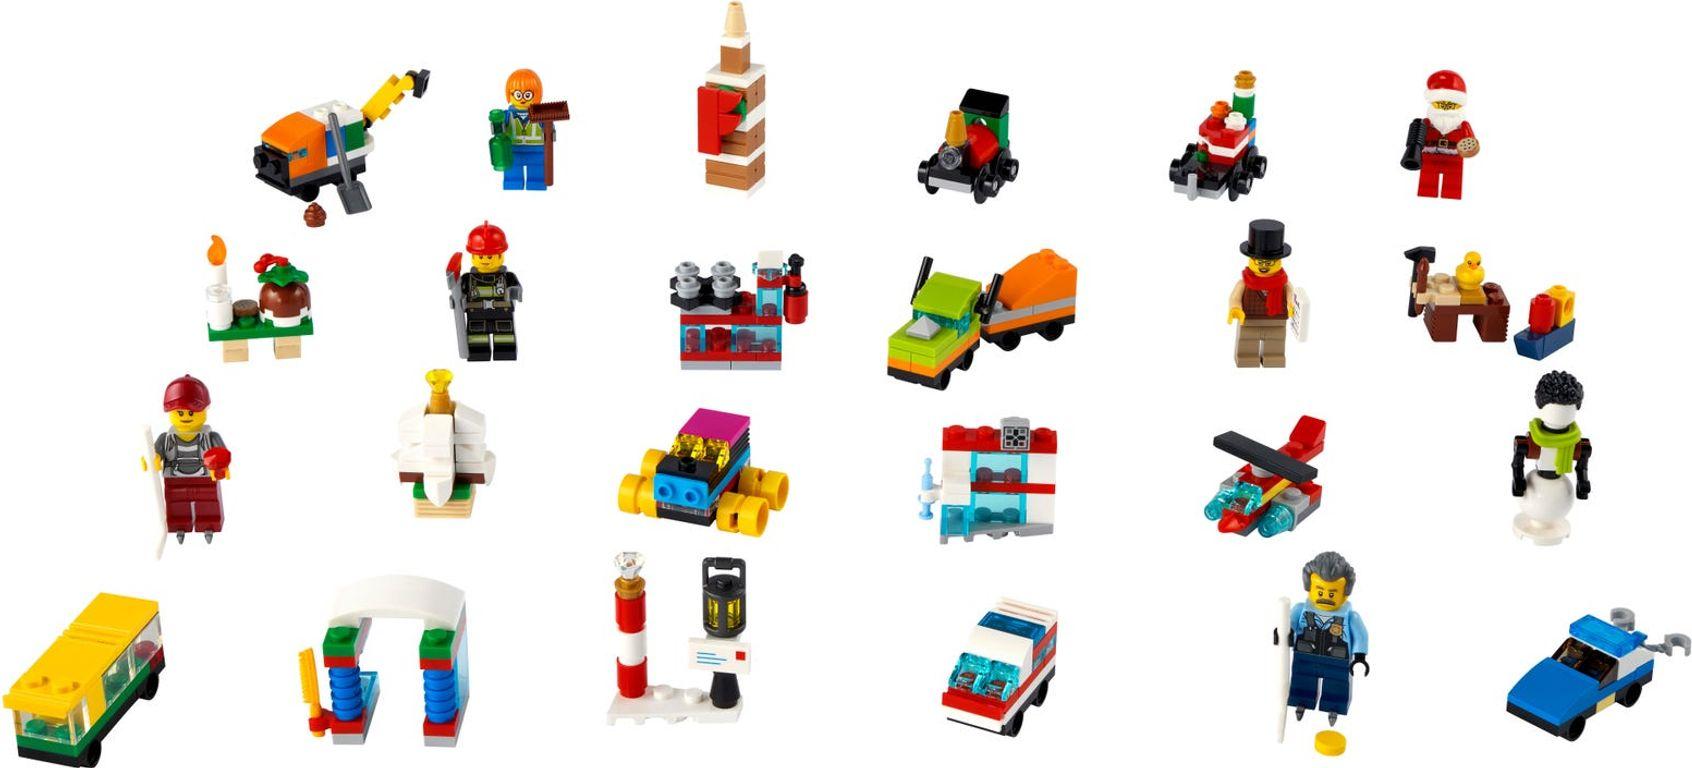 LEGO® City Advent Calendar 2021 components